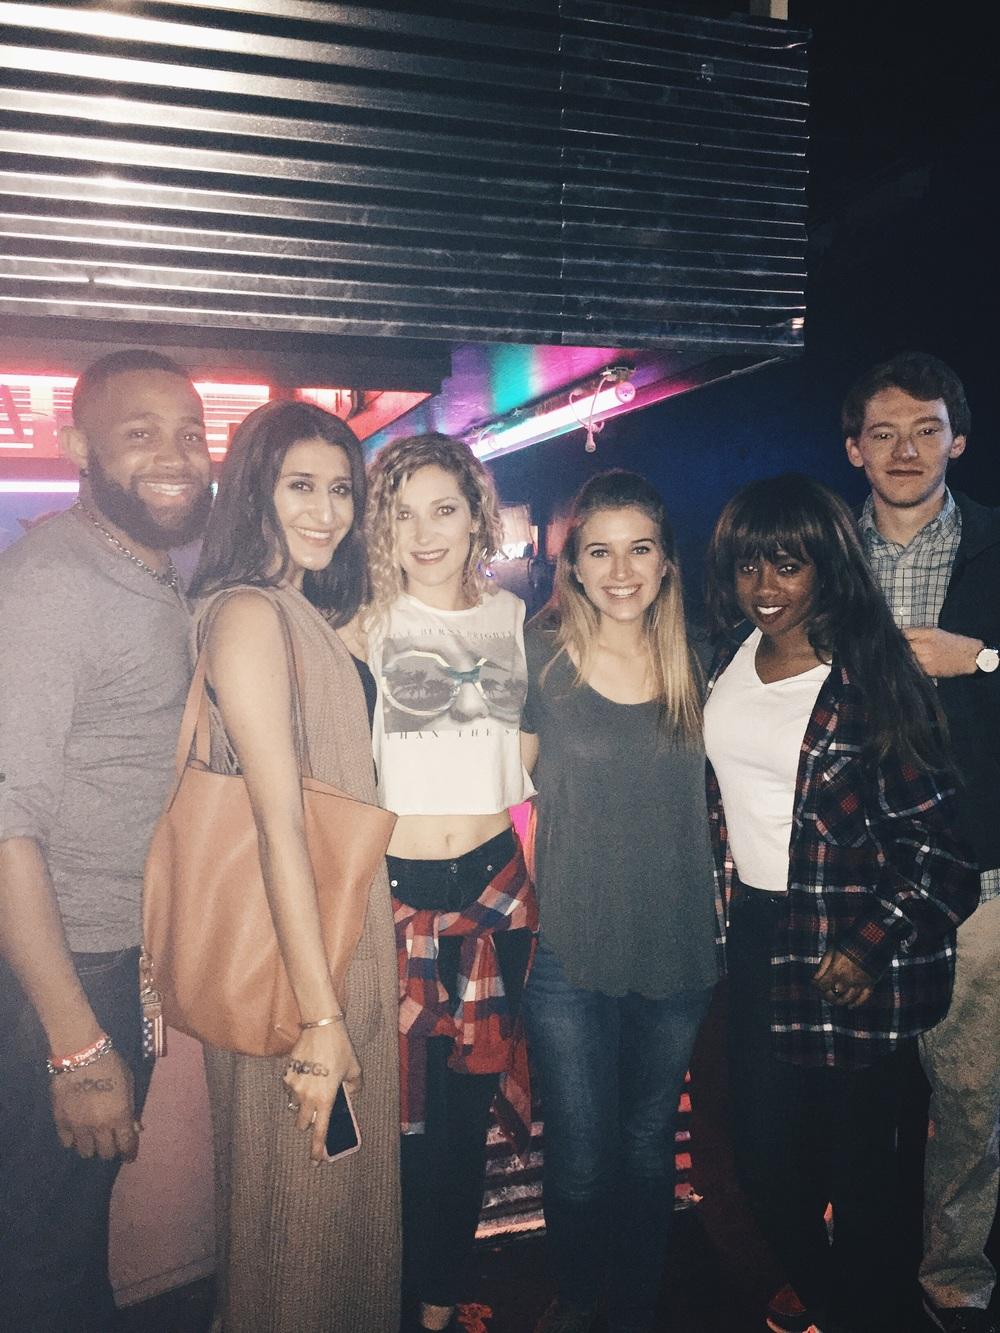 Jermaine, Eri, Amber, Ryan, Chelsea, and Wil